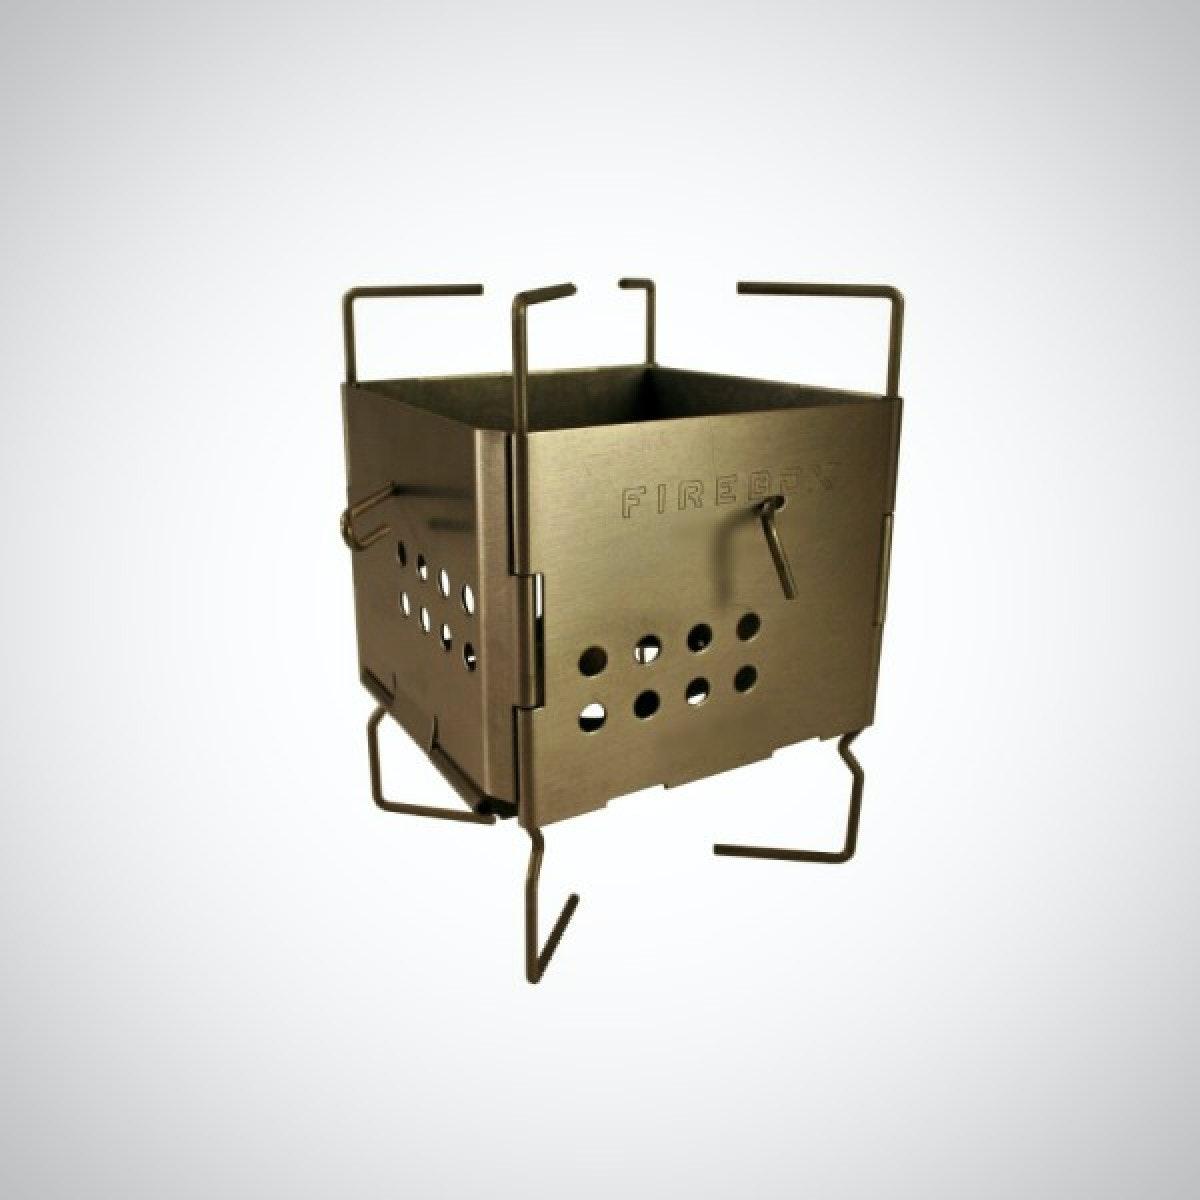 Firebox Nano Gen II - 4 oz Titanium Folding Ultralight Stove